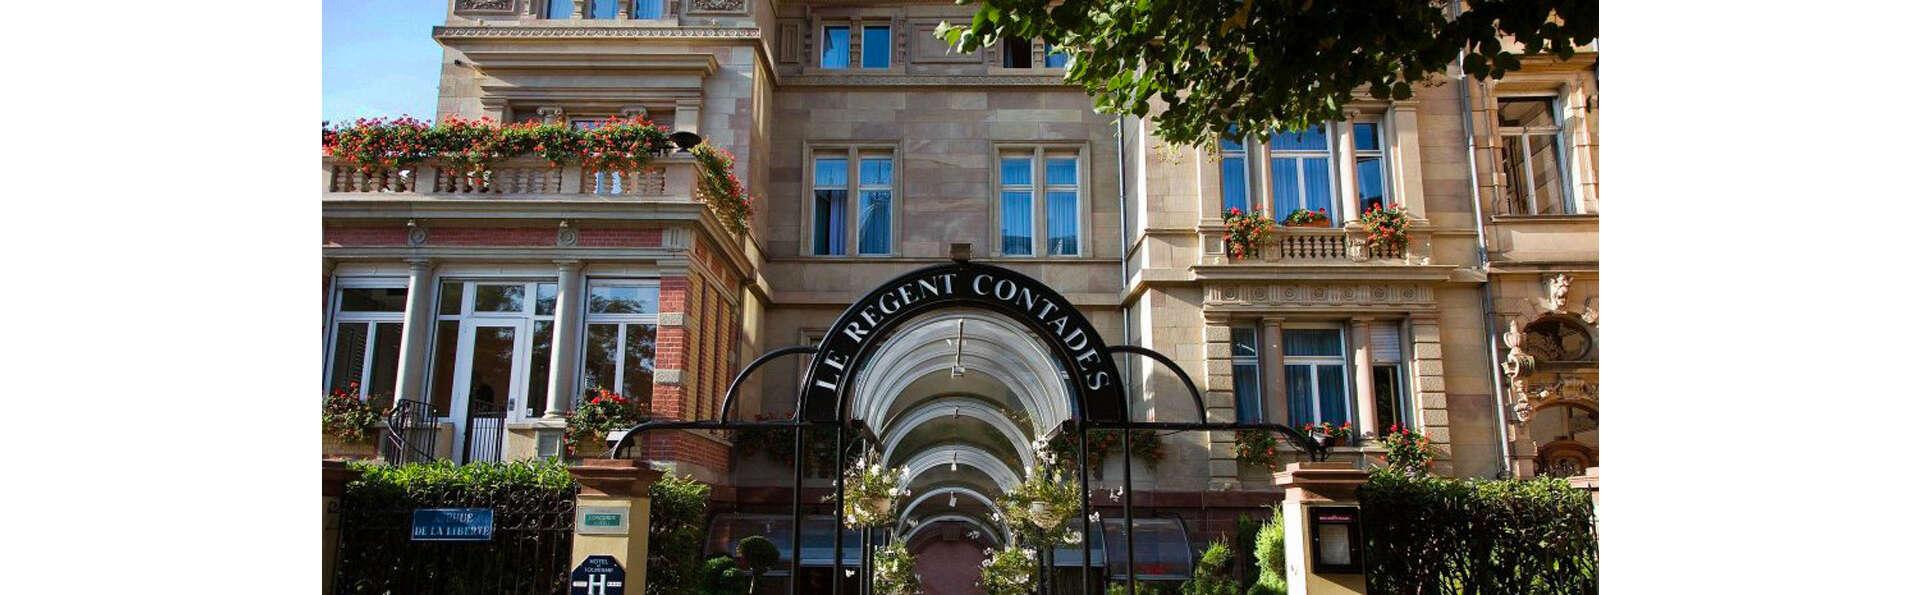 Regent Contades, BW Premier Collection - EDIT_FRONT_01.jpg